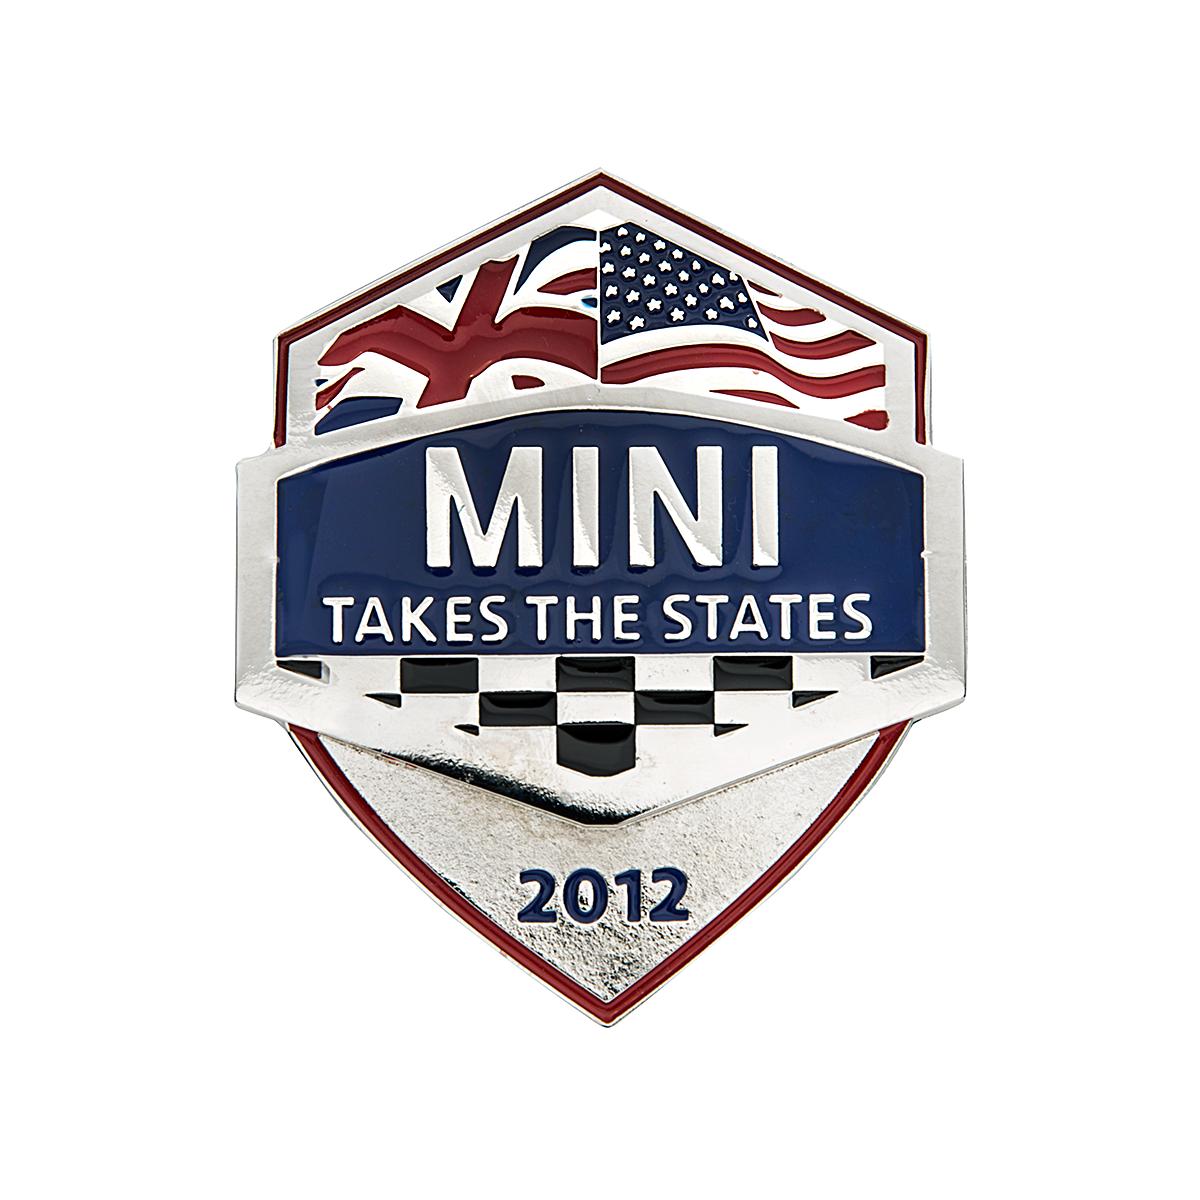 Mini_Takes_The_states.png